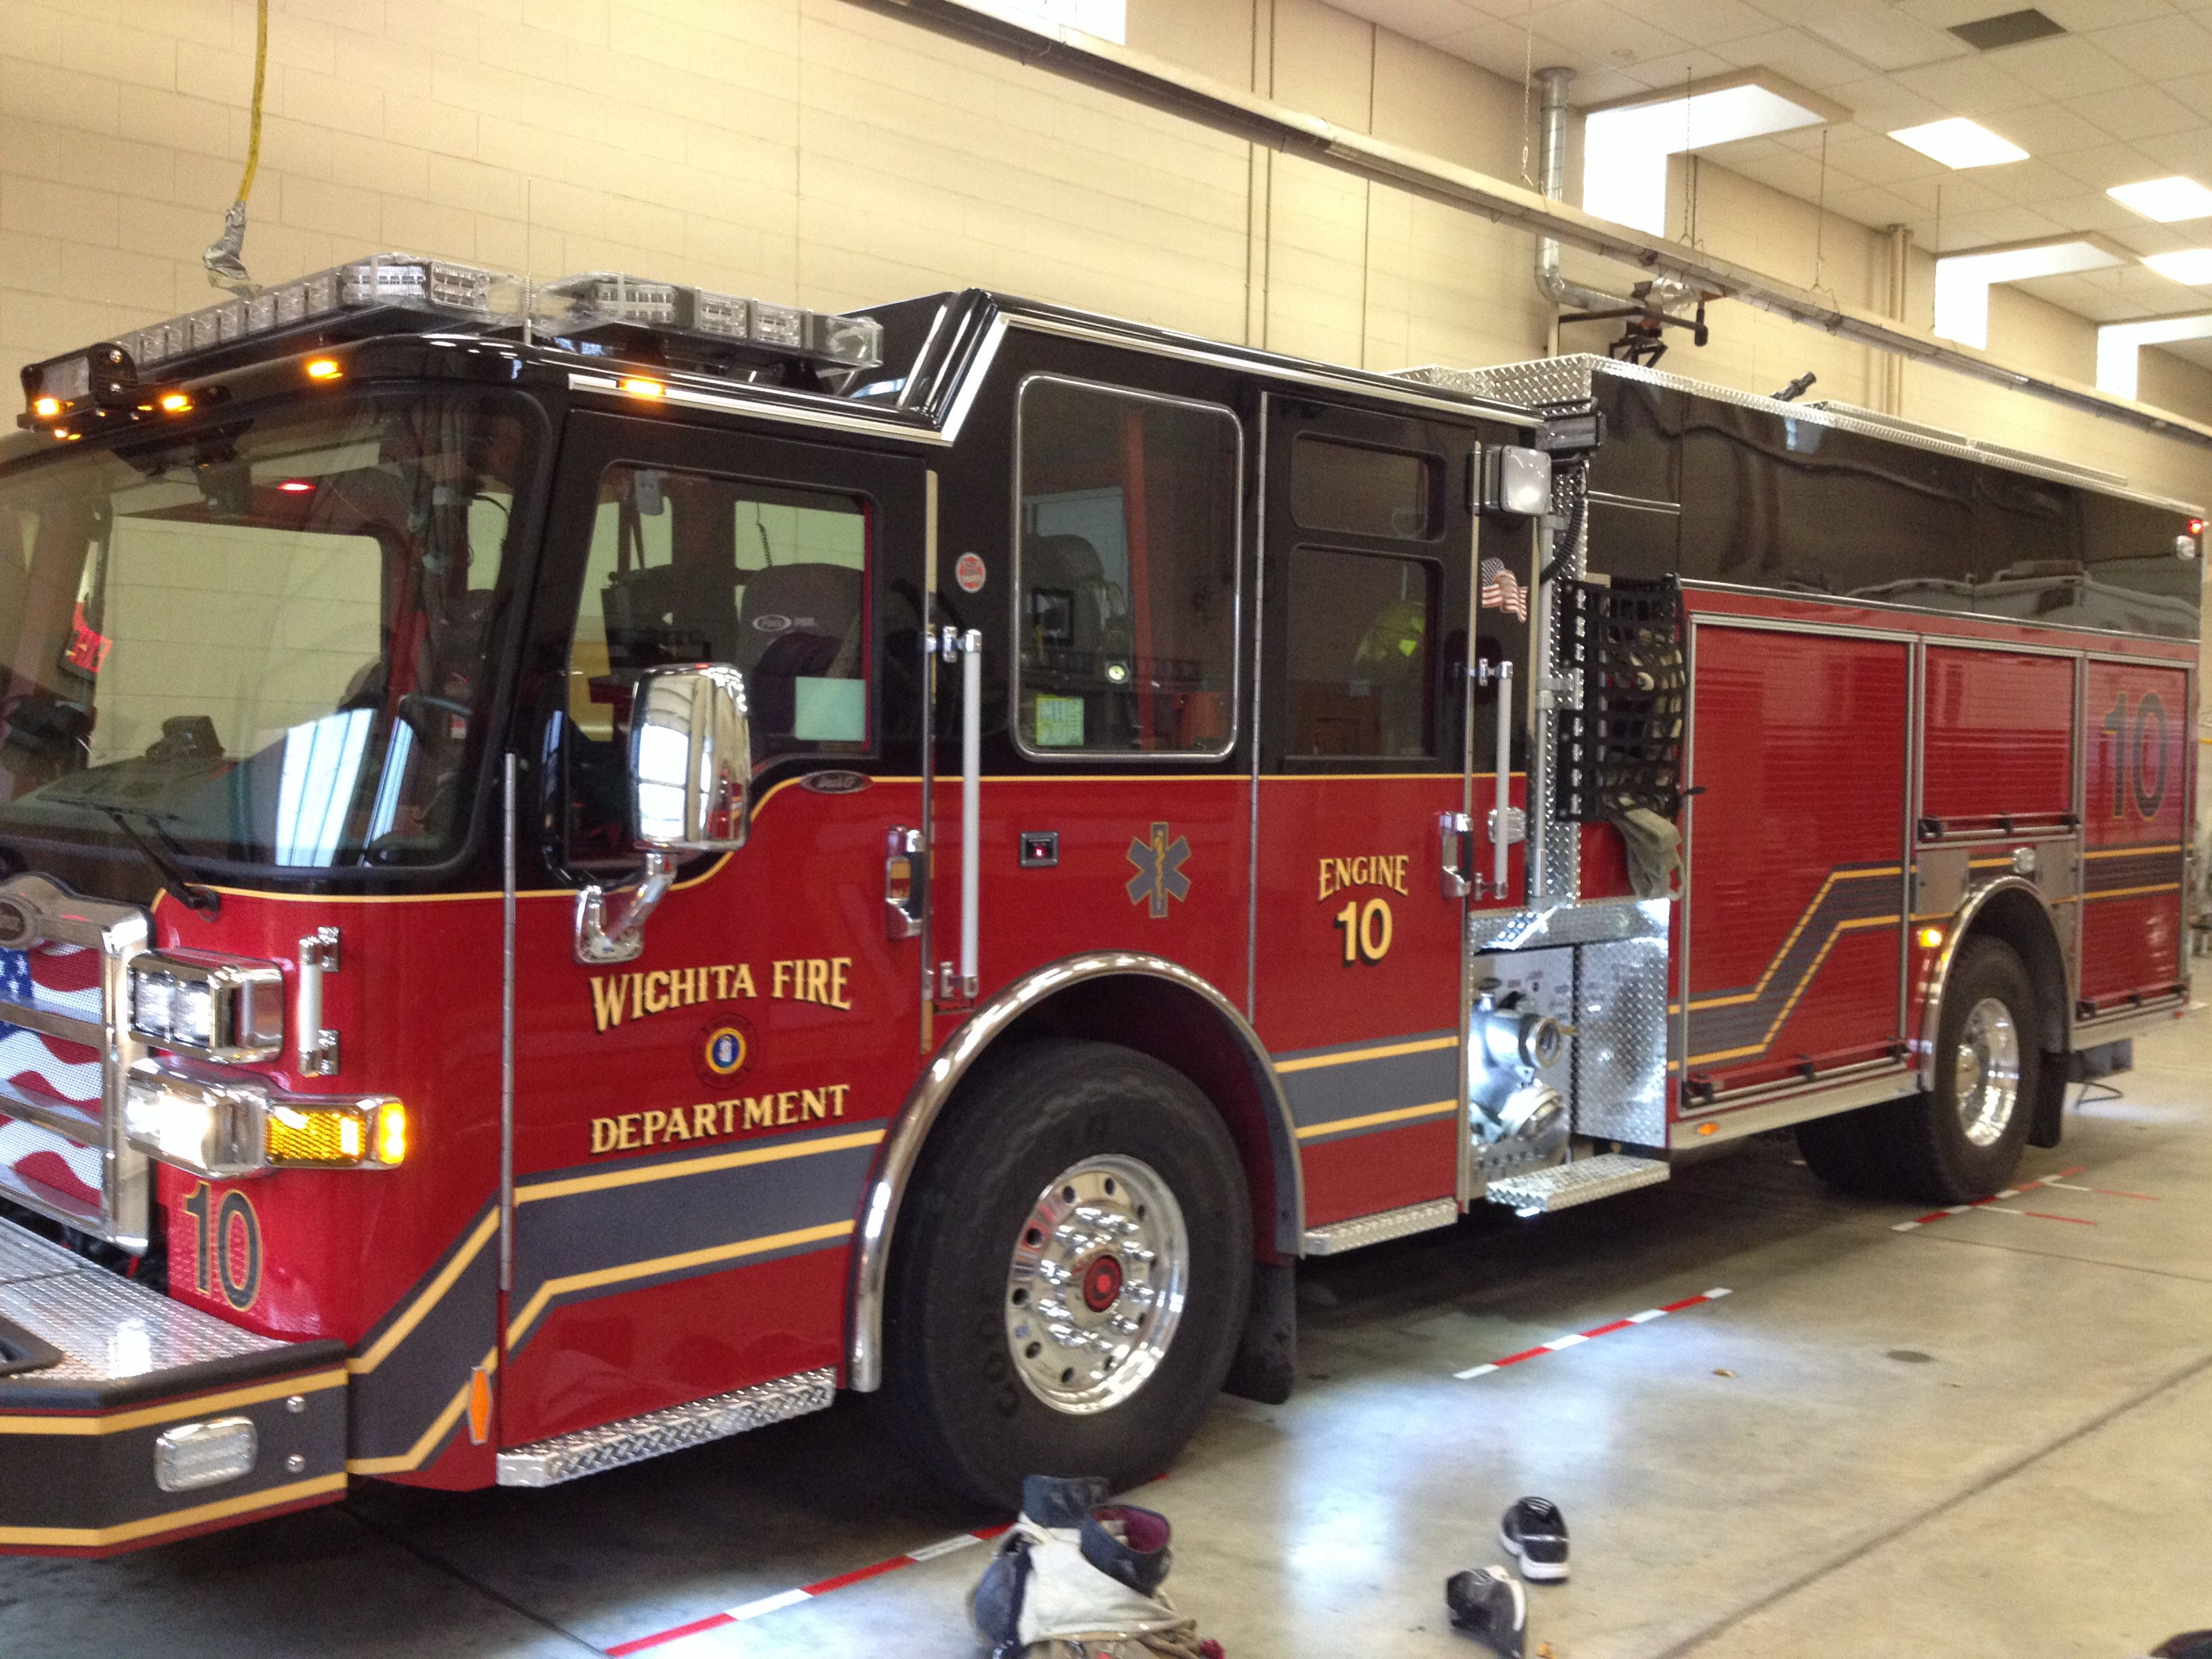 I'm driving my new fire engine today. Wichita Fire